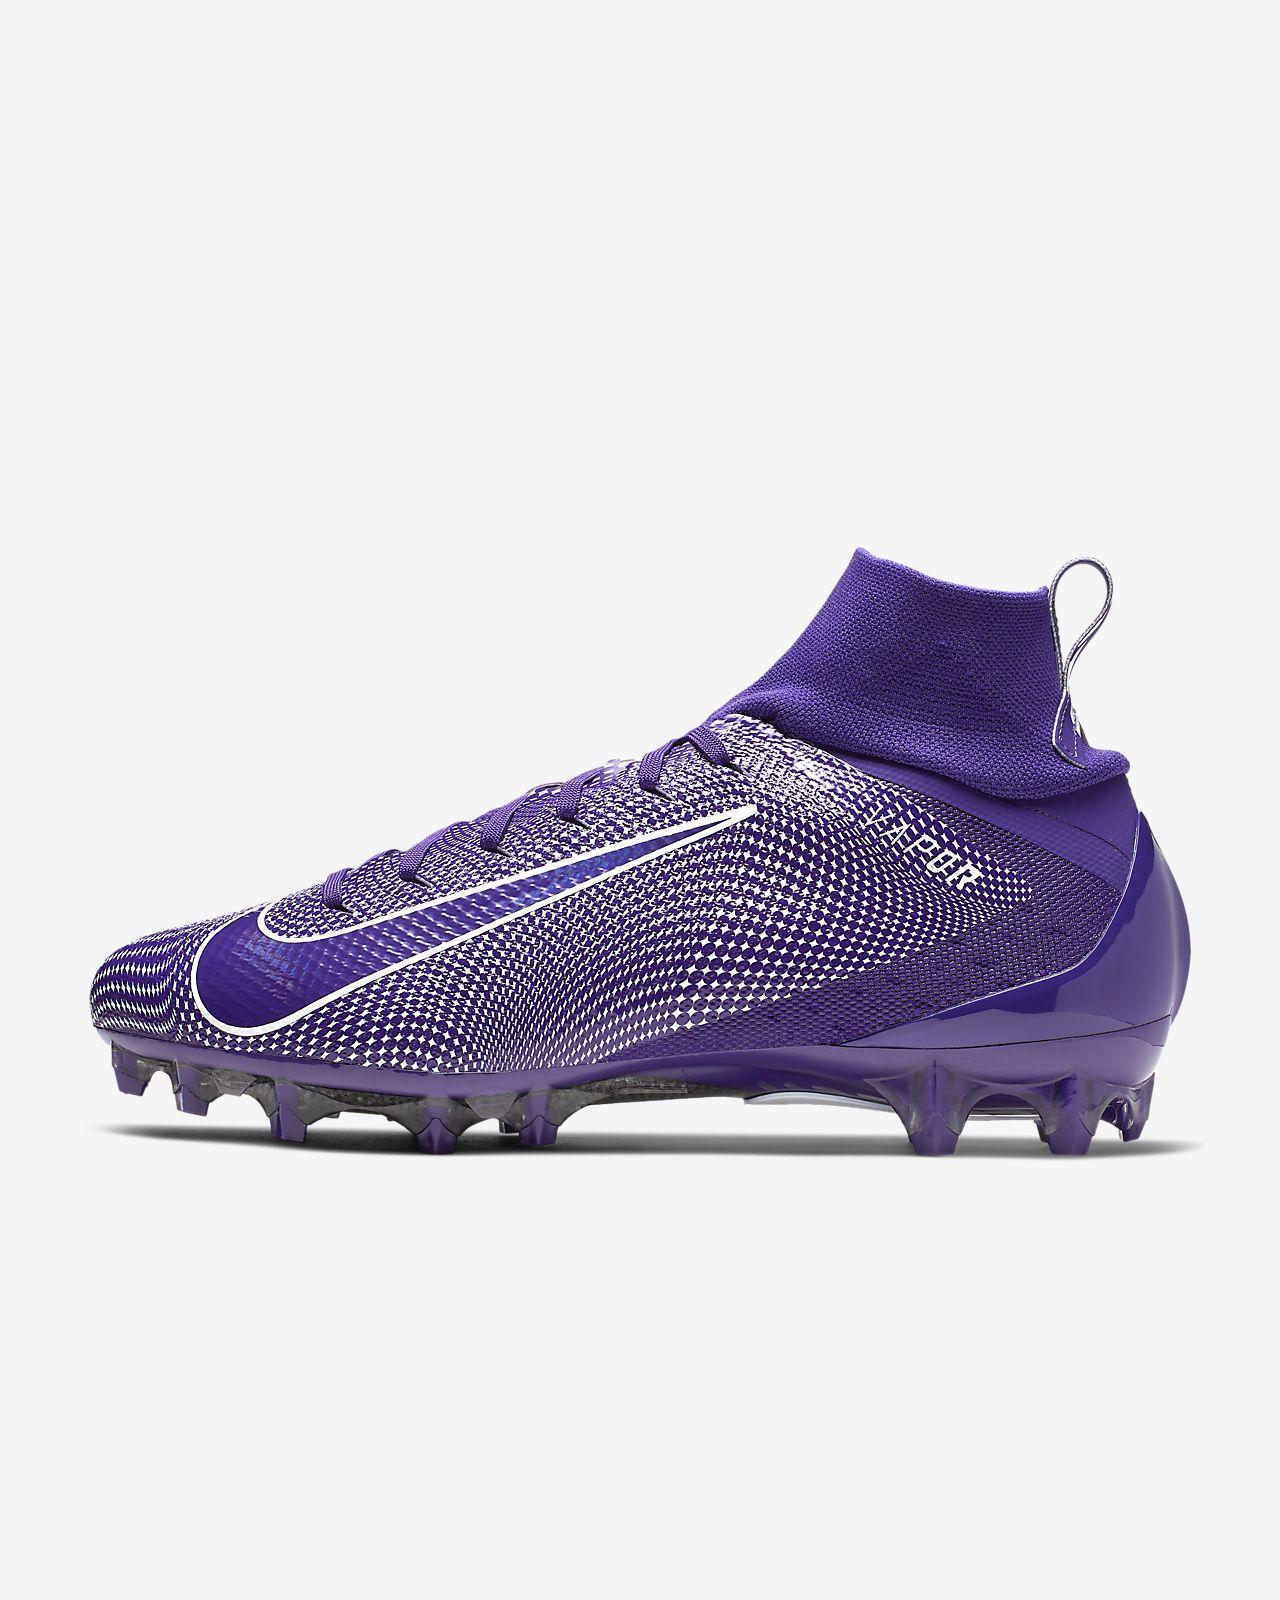 Nike Vapor Untouchable 3 Pro Football Cleat